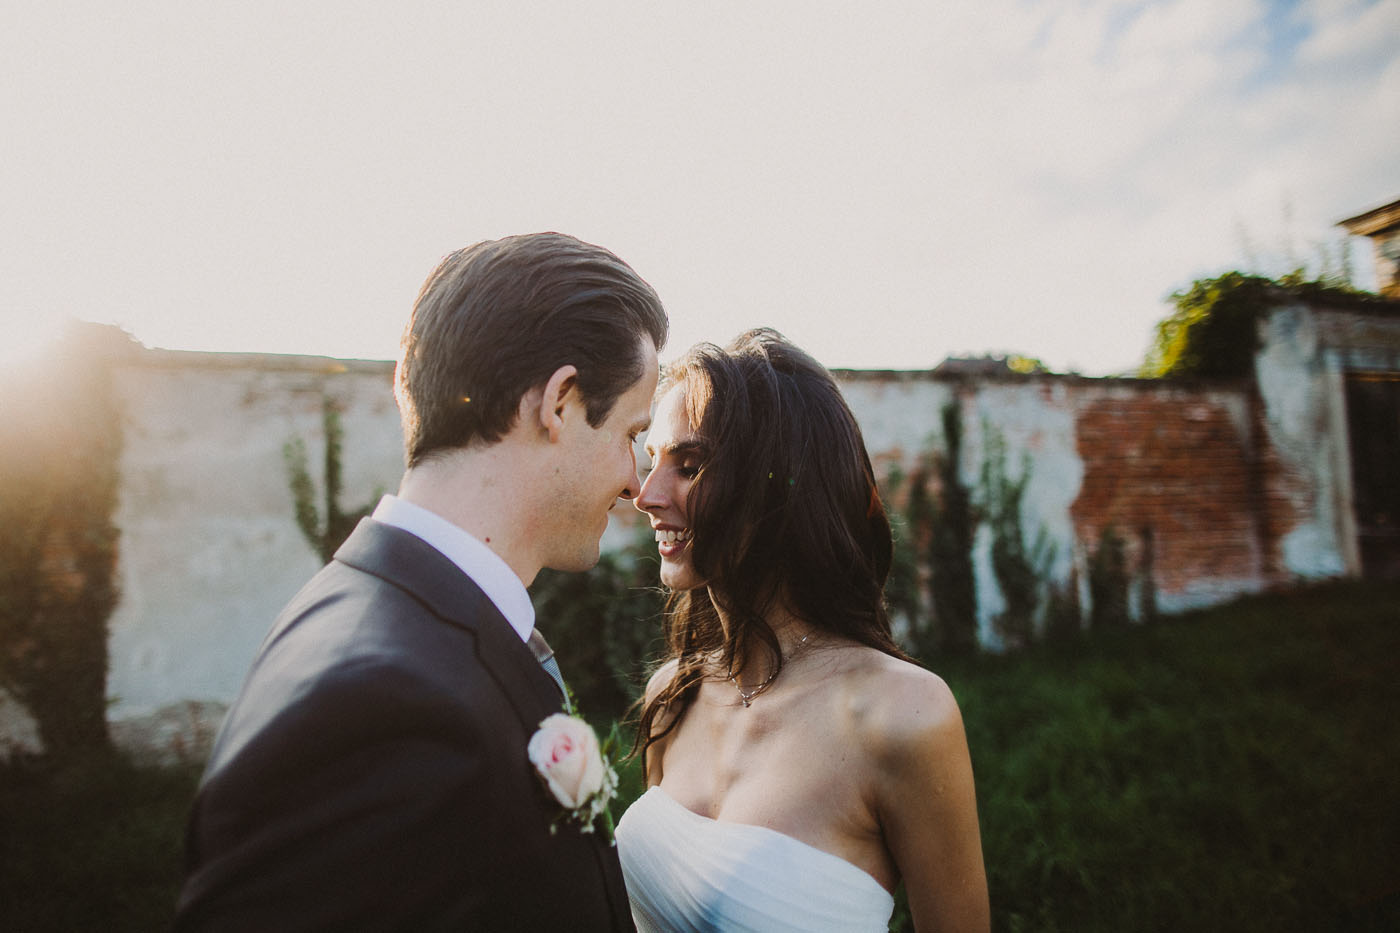 wedding-photographer-walpersdorf-austria-16